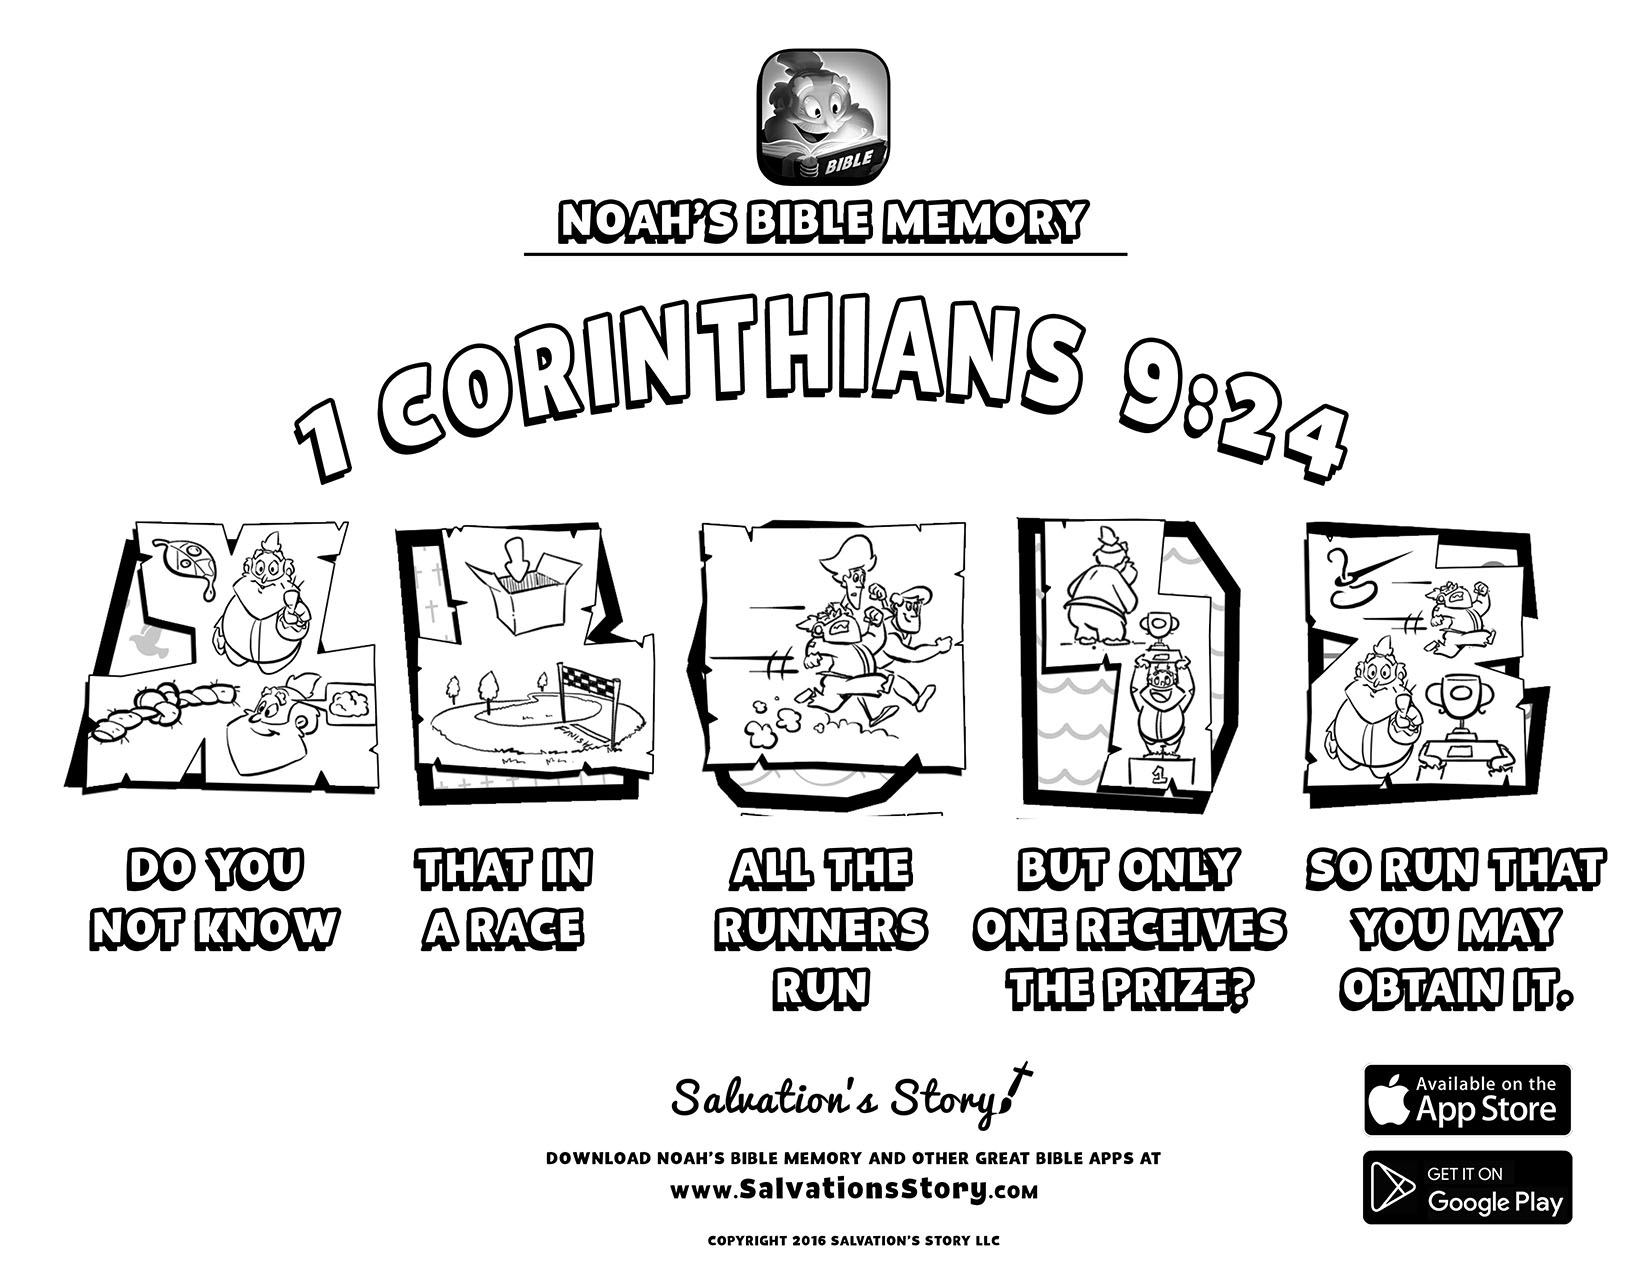 Salvations Story - Bible Memory  1 Corinthians 9-24.jpg